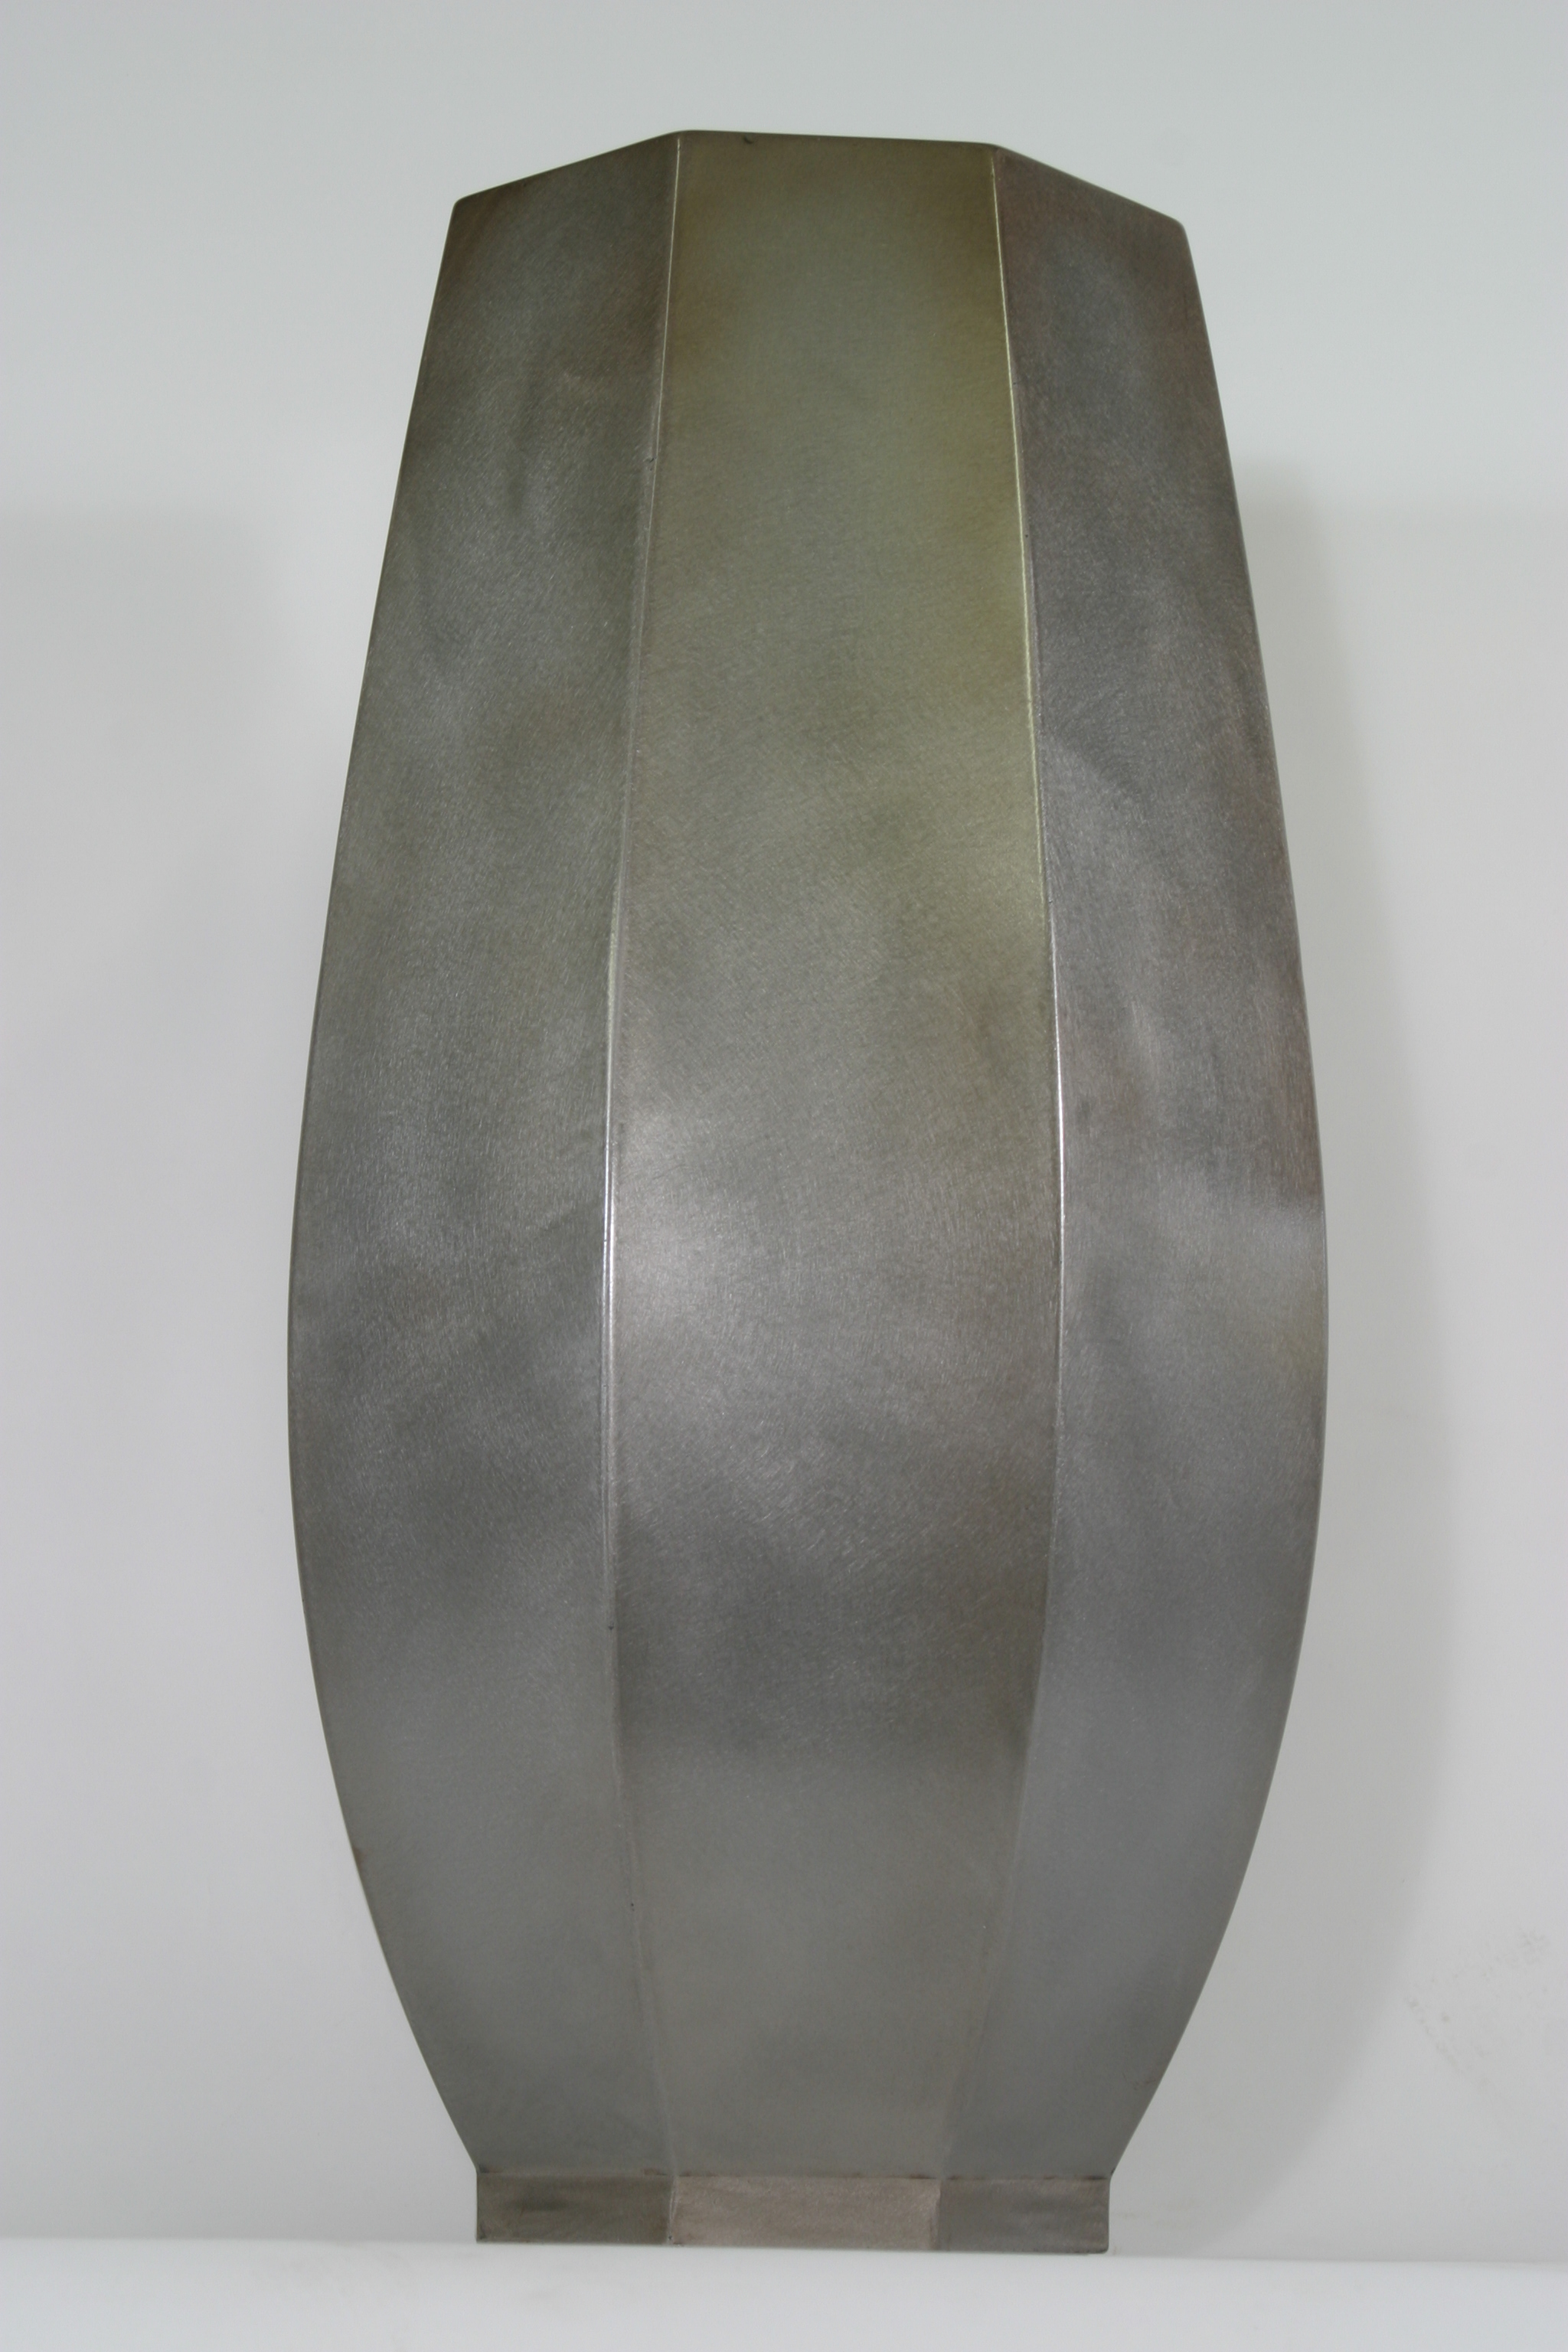 Malibu Ca Custom Fine Art Jardinieres Vases Amp Urns Gillberg Design Inc